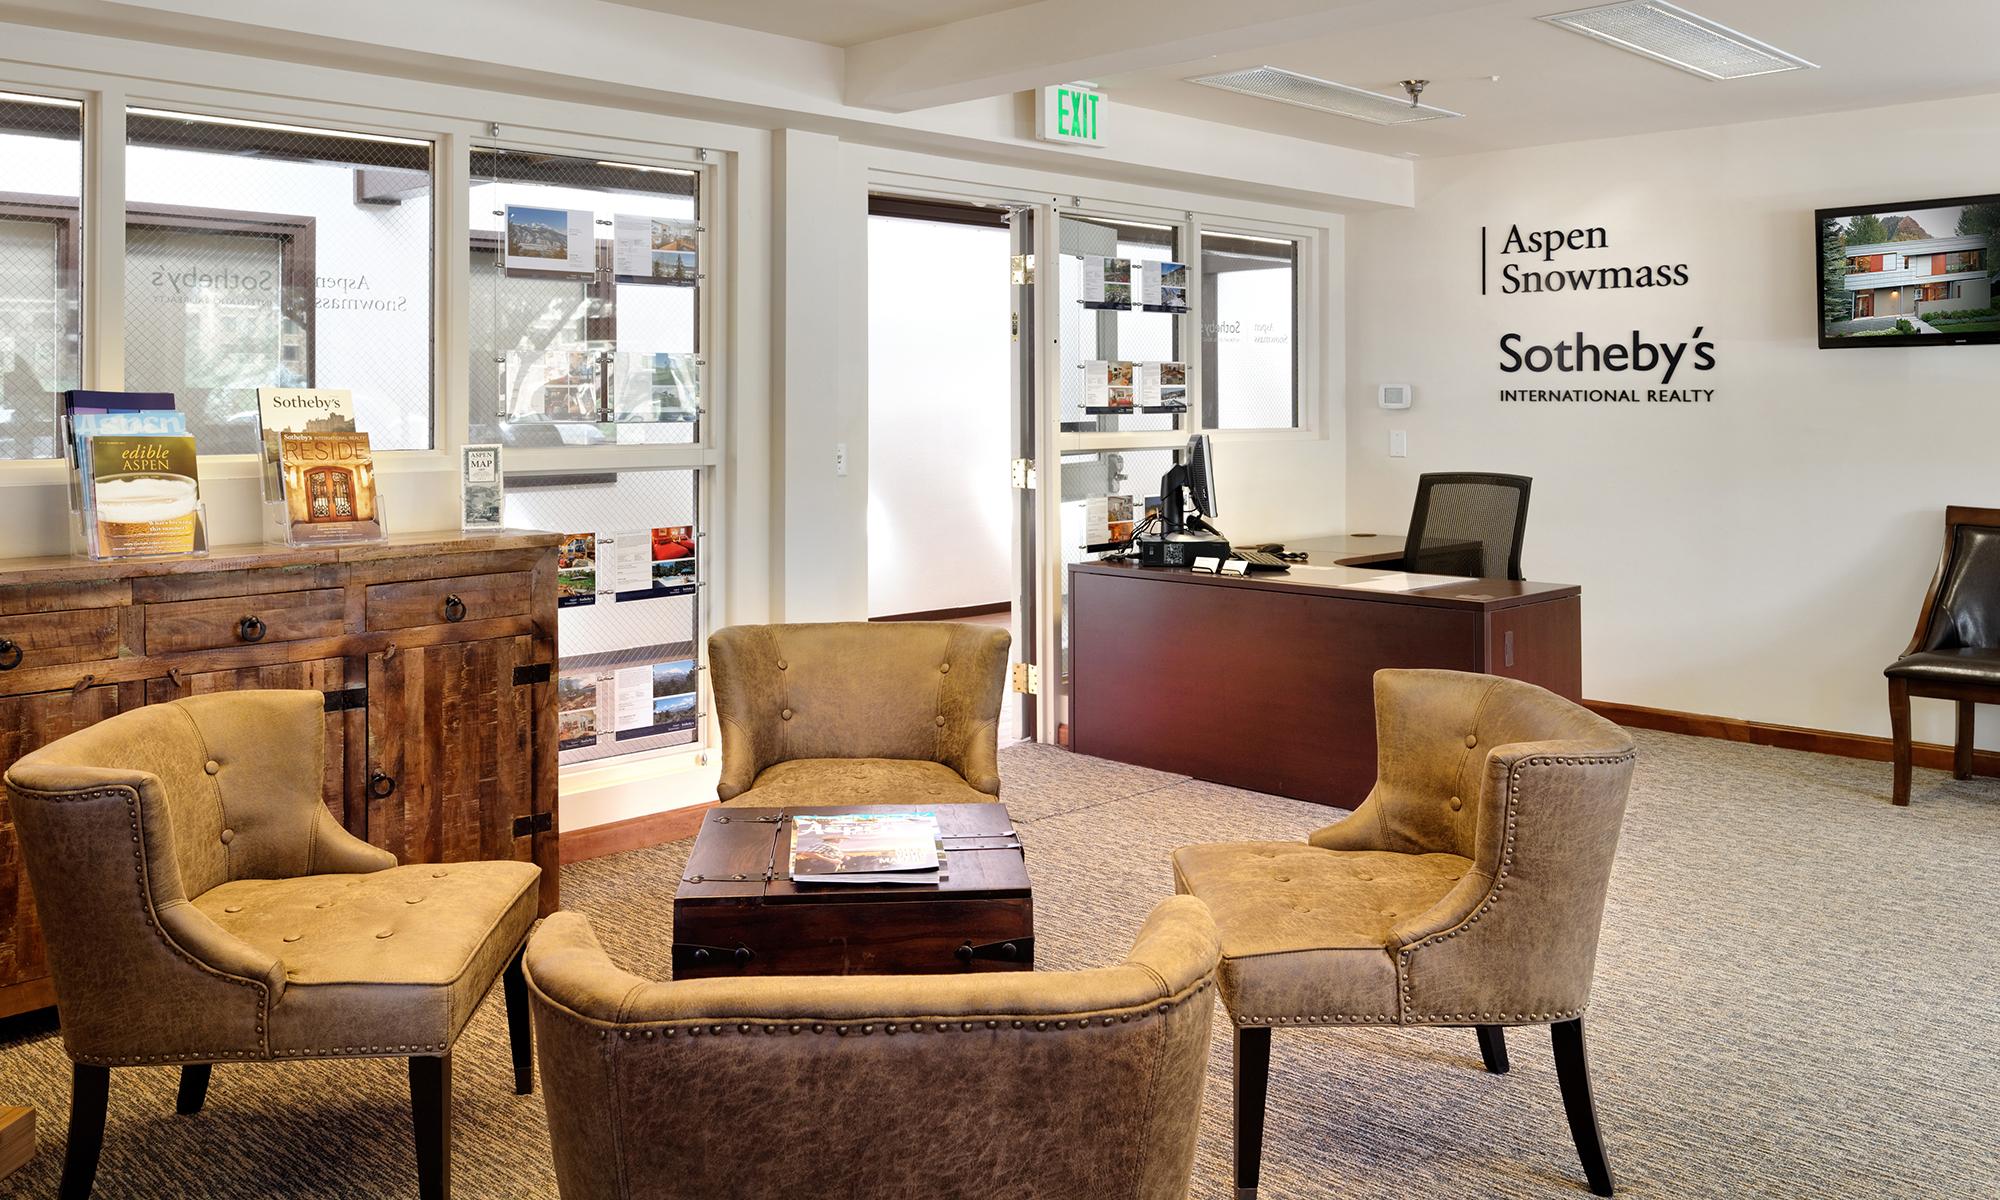 Aspen Snowmass Sotheby's International Realty